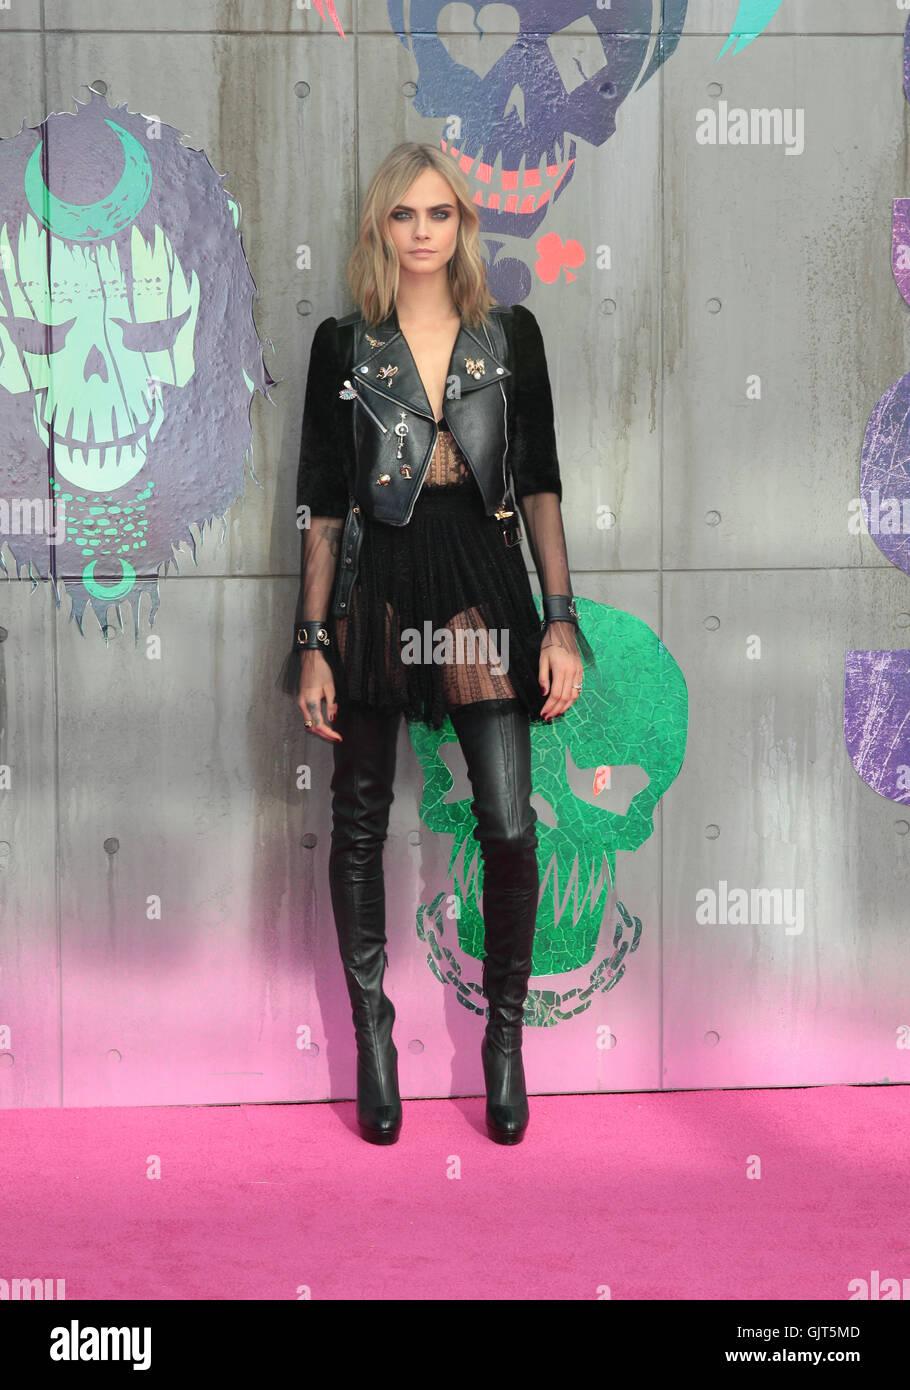 Cara Delevingne Attends The Suicide Squad Film Premiere London